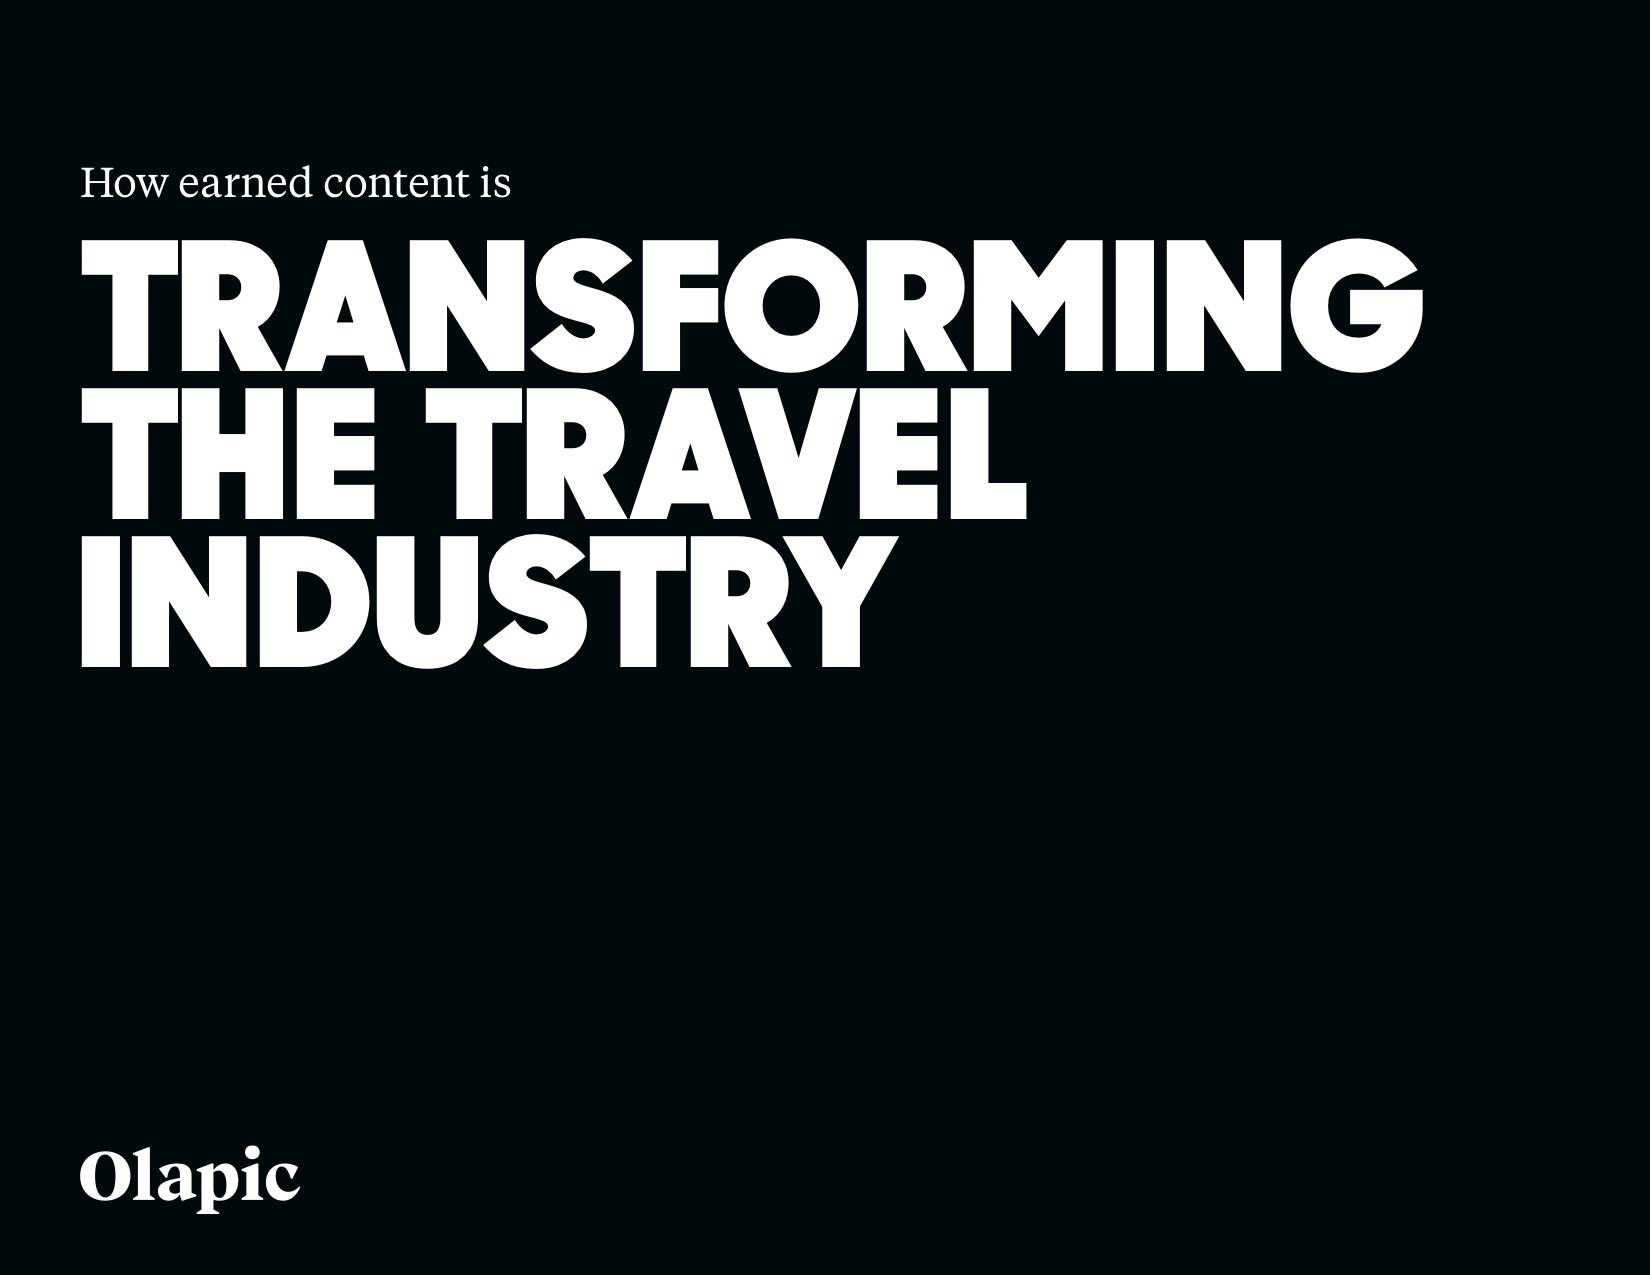 Transforming-The-Travel-Industry-2016.jpg